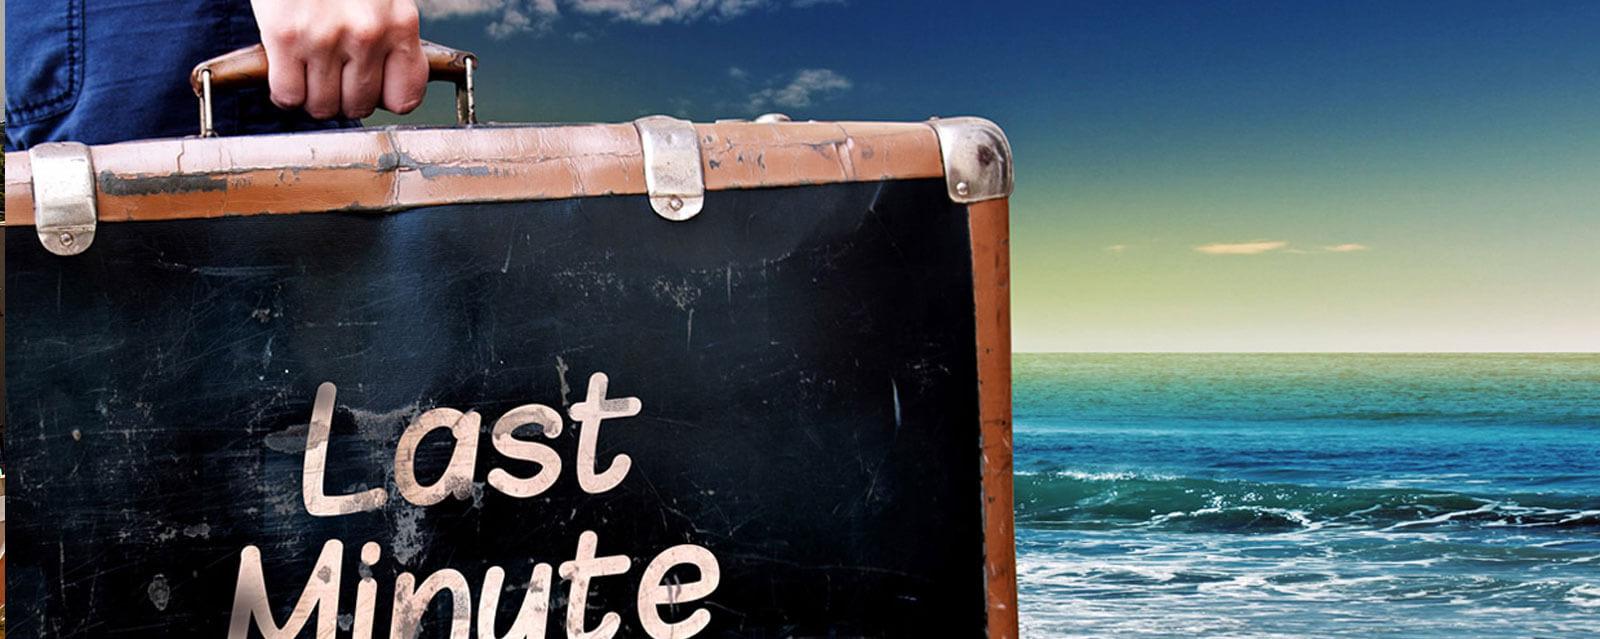 Vacanze a Ischia, Pacchetti Vacanze Ischia Mare, Offerte Vacanza Ischia